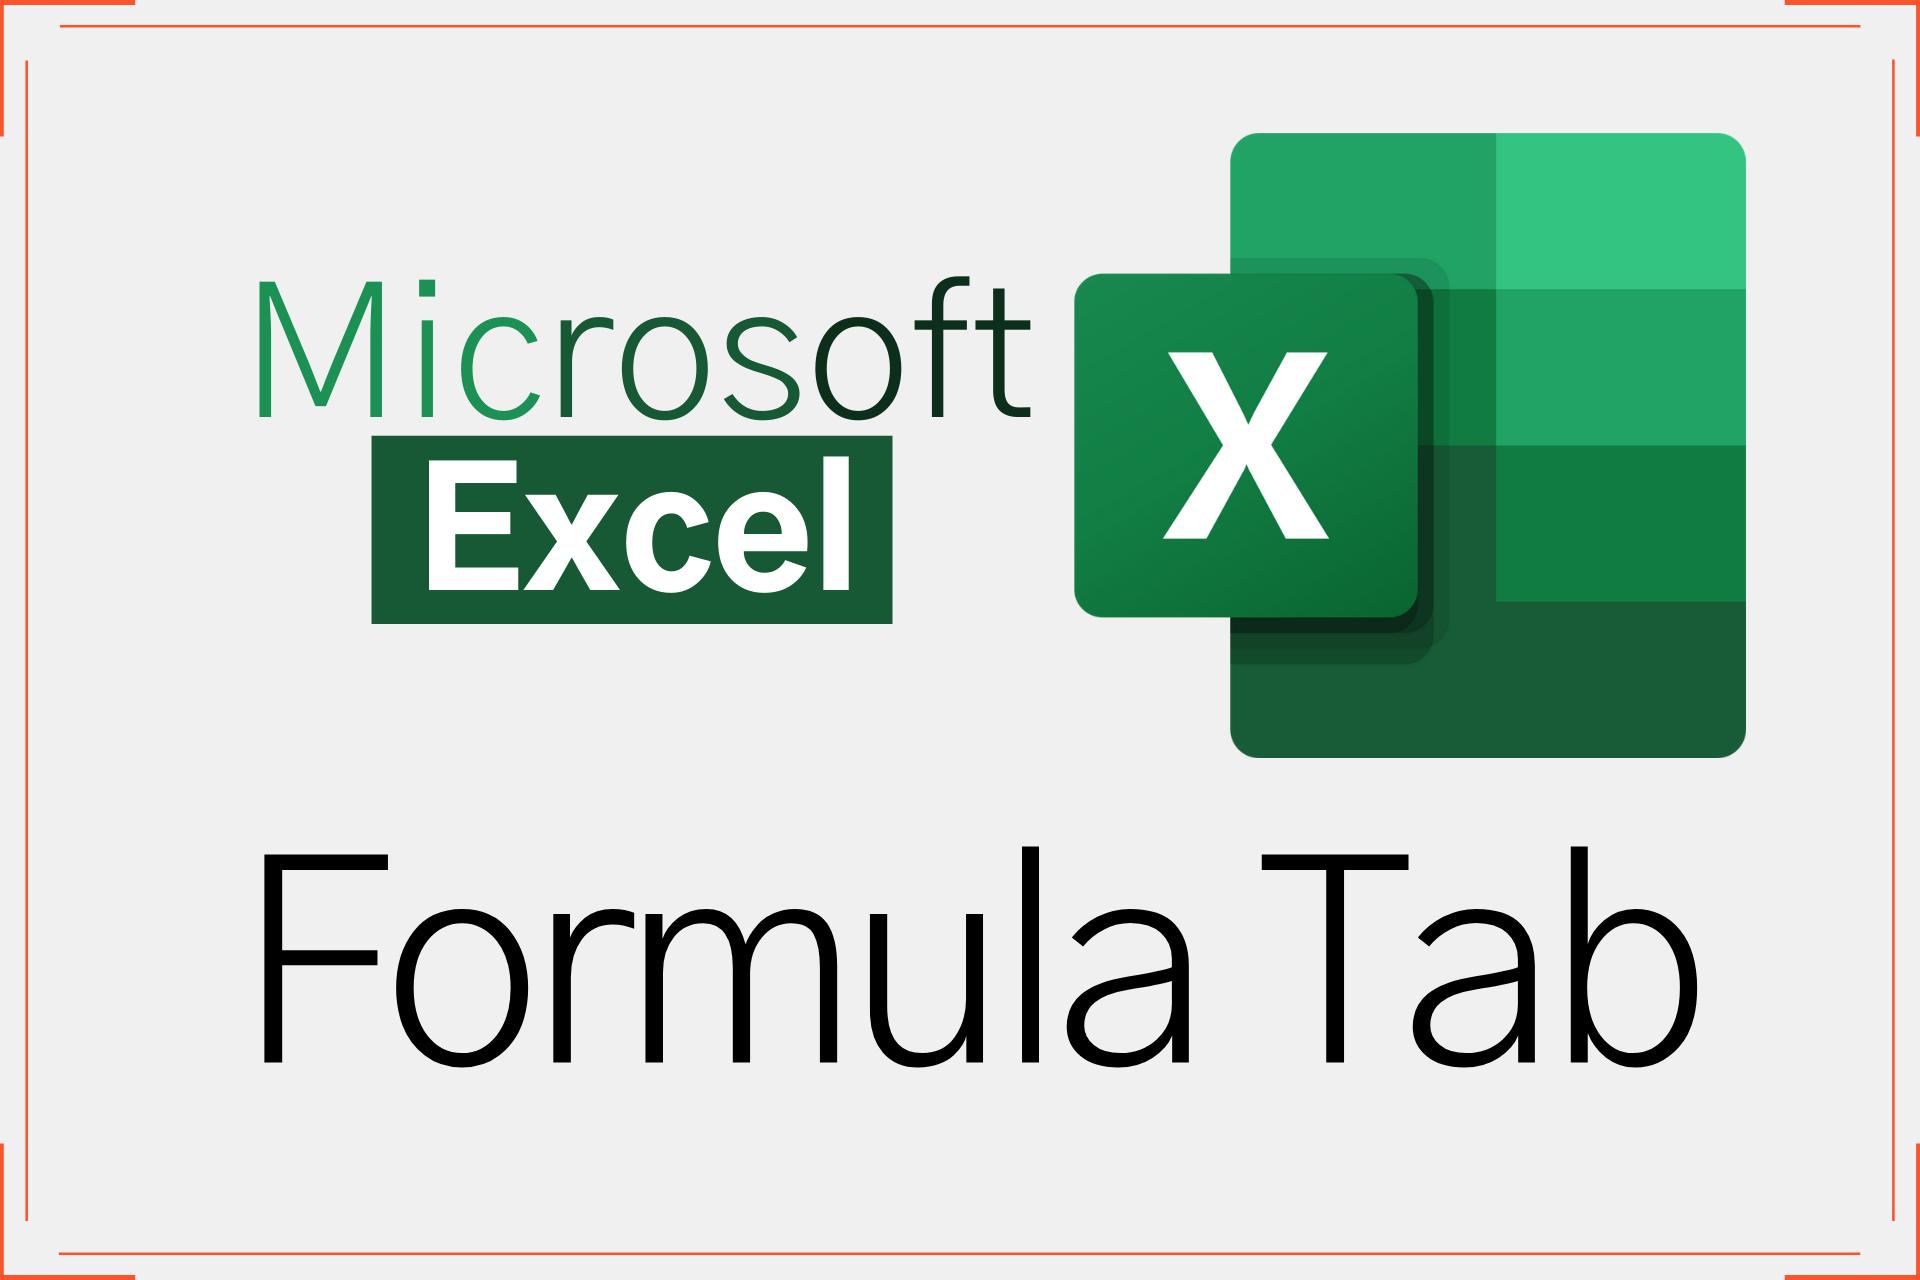 MS Excel formula tab in Hindi 2021